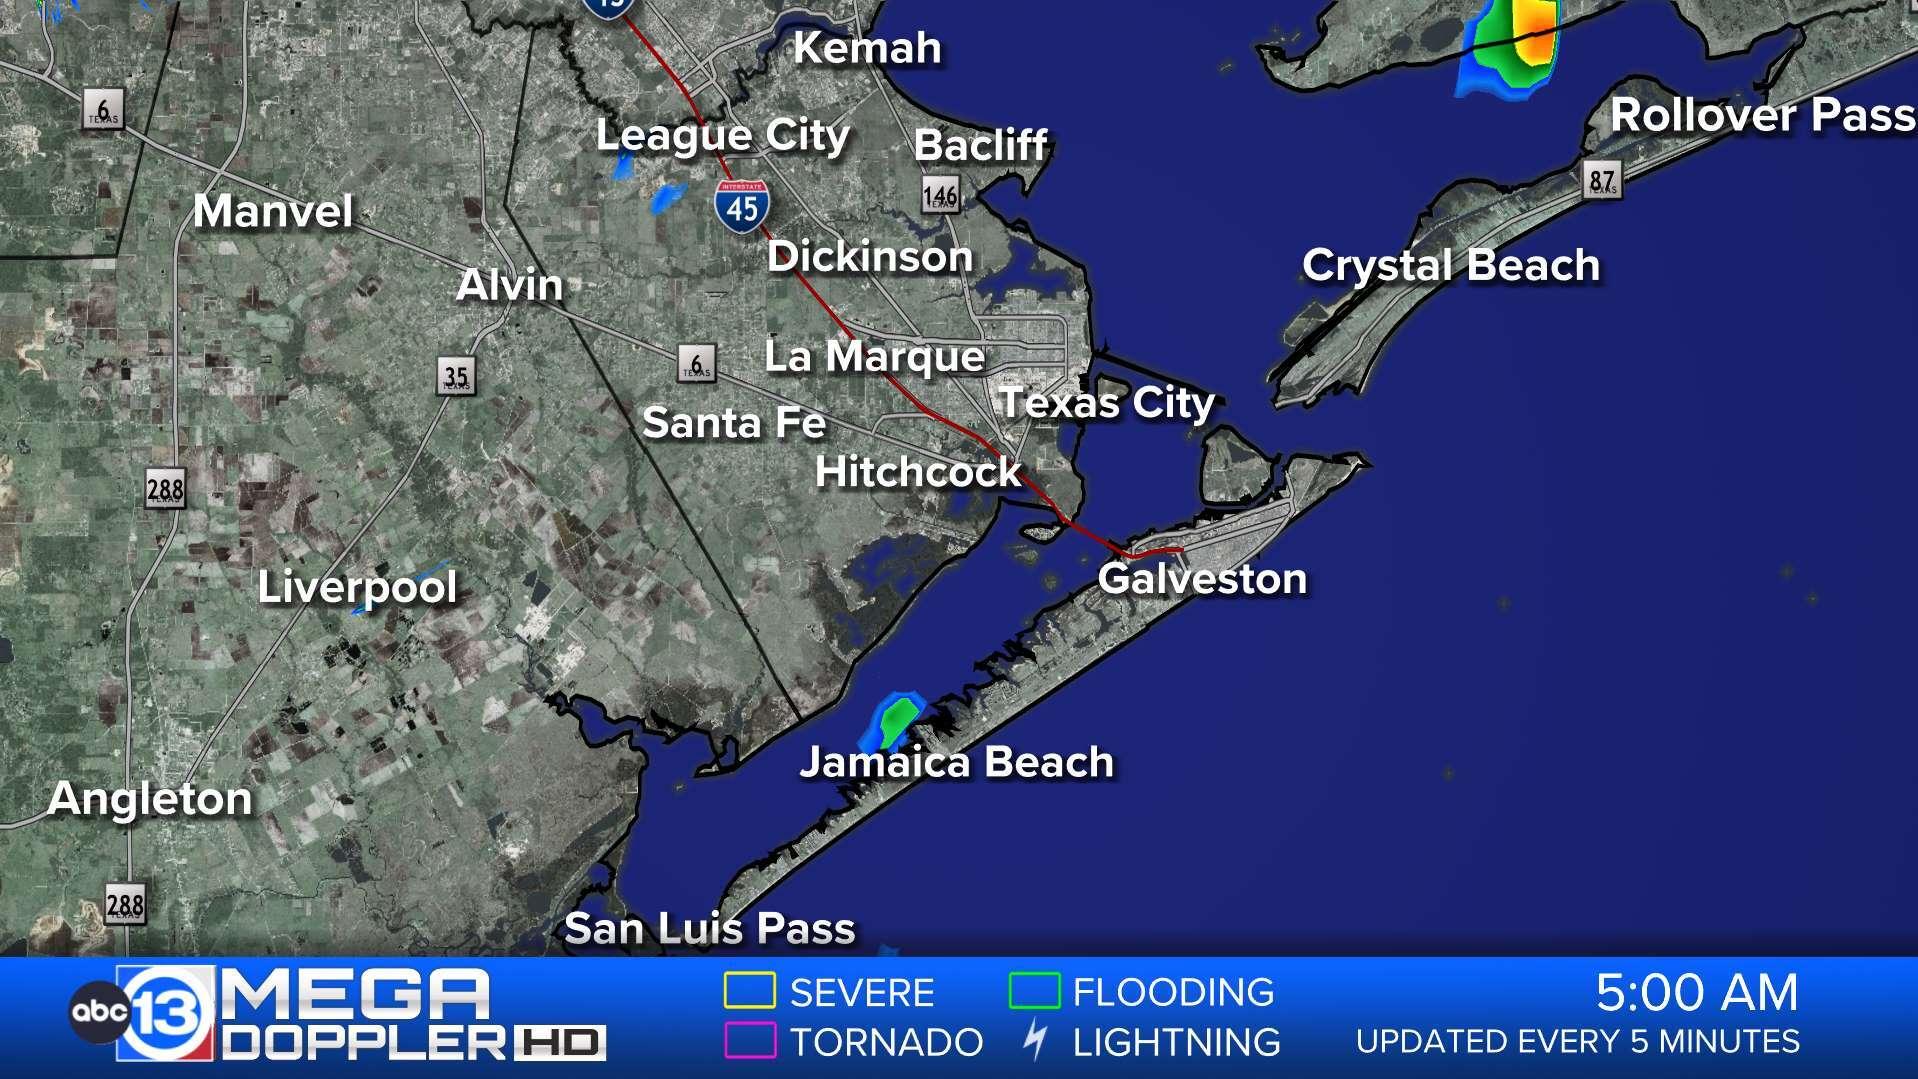 Southeast Texas Radar | abc13.com on blank map of fredericksburg, blank map of dallas, blank map of atlanta, blank map of texas, blank map of charleston, blank map of cozumel, blank map of jacksonville, blank map of virginia beach, blank map of new orleans,